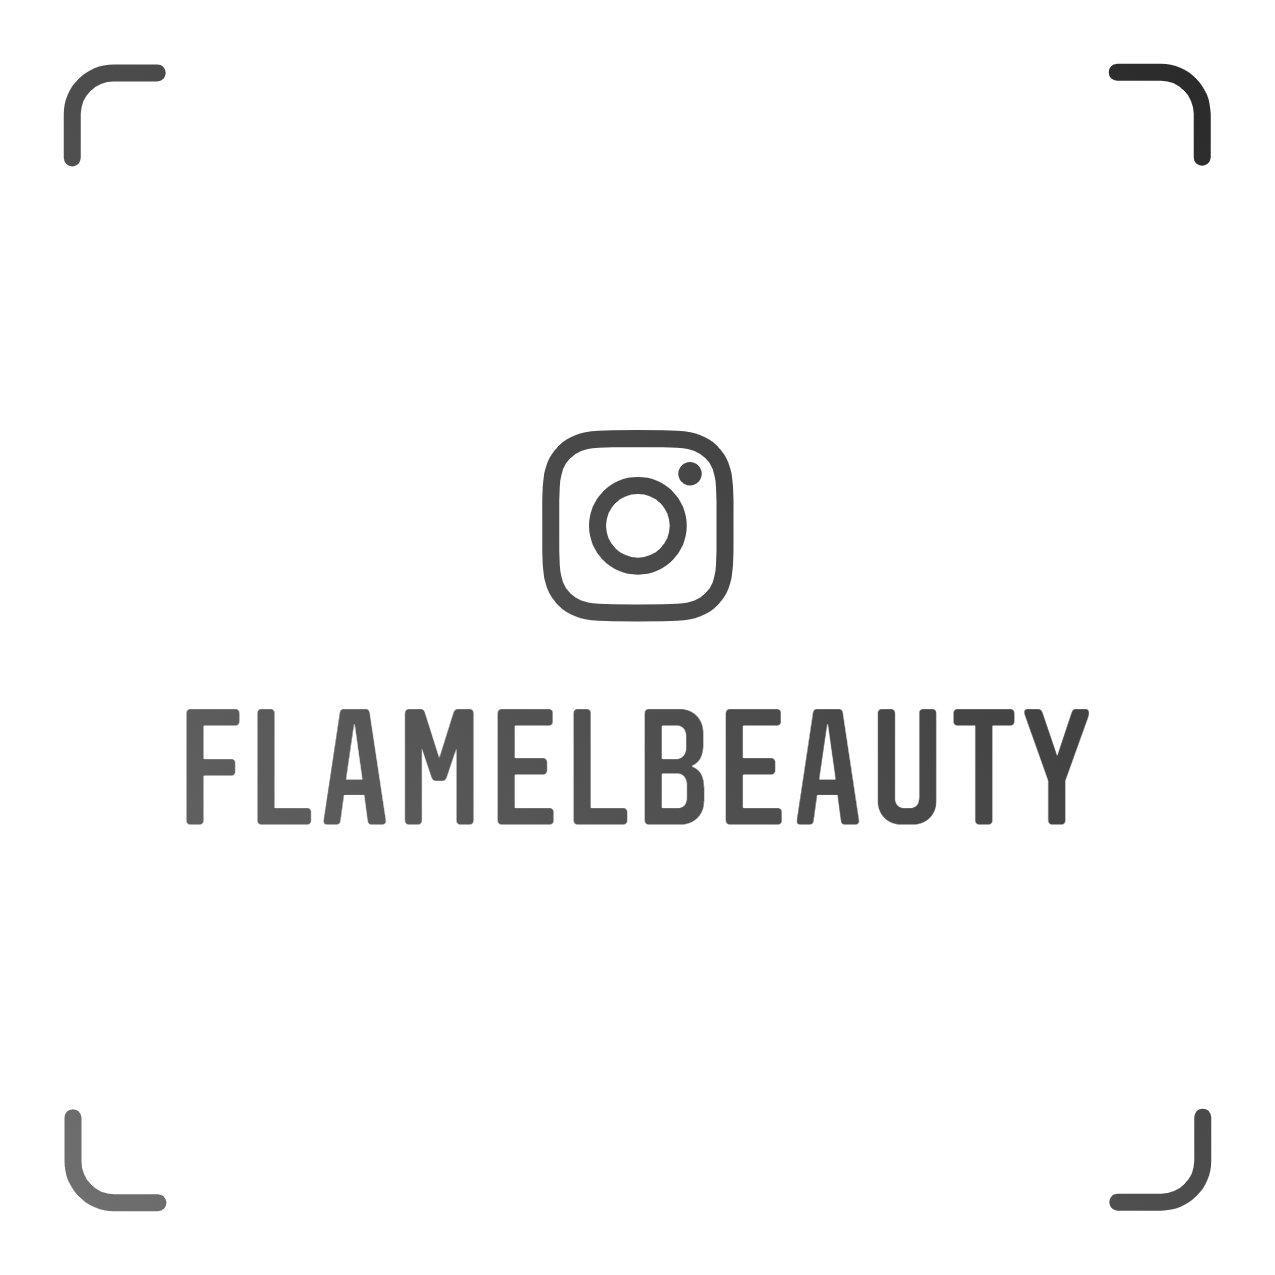 фотография Клиники косметологии Flamel beauty zone на метро Технопарк